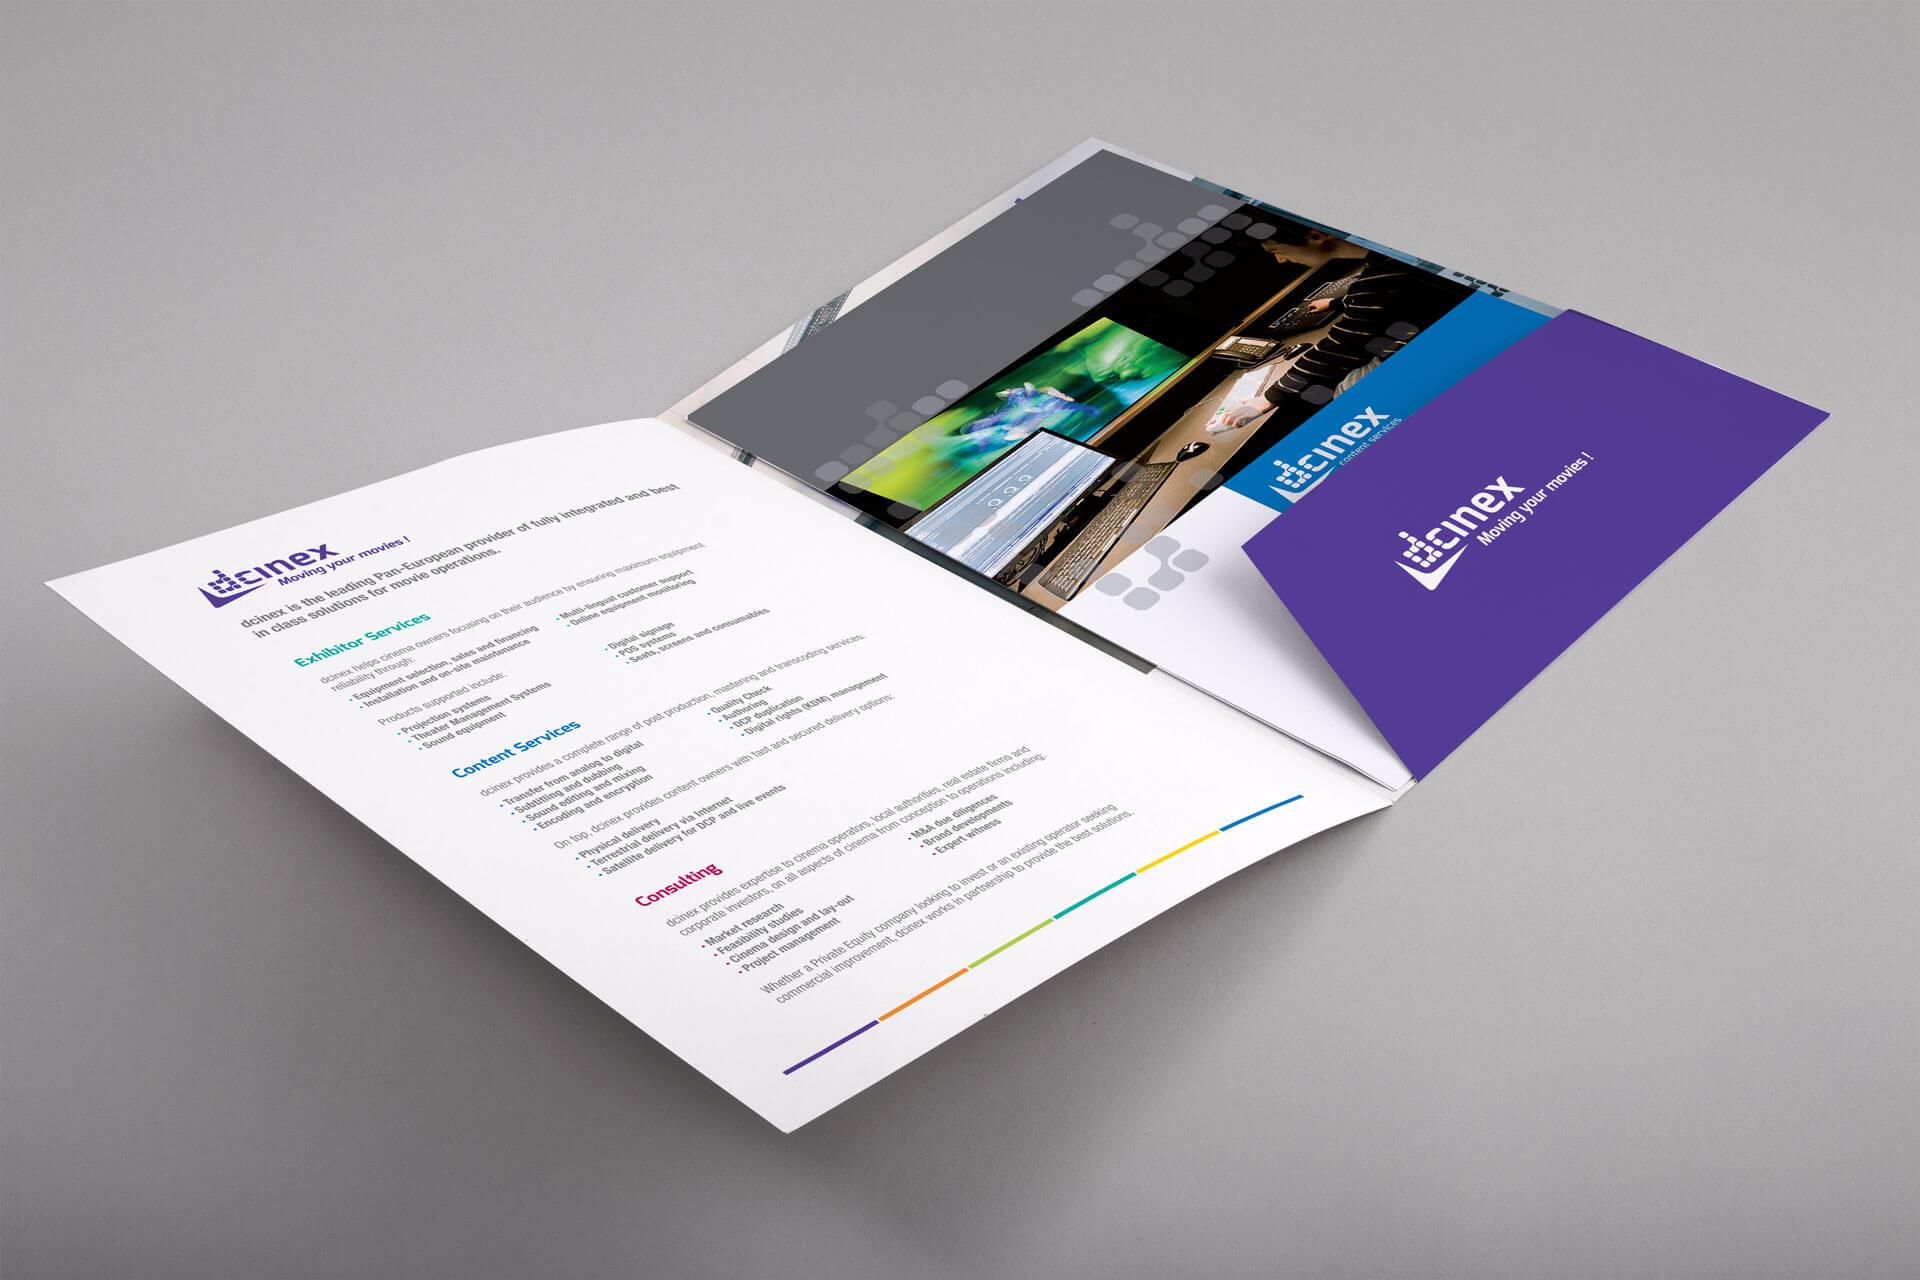 dcinex Folder 1